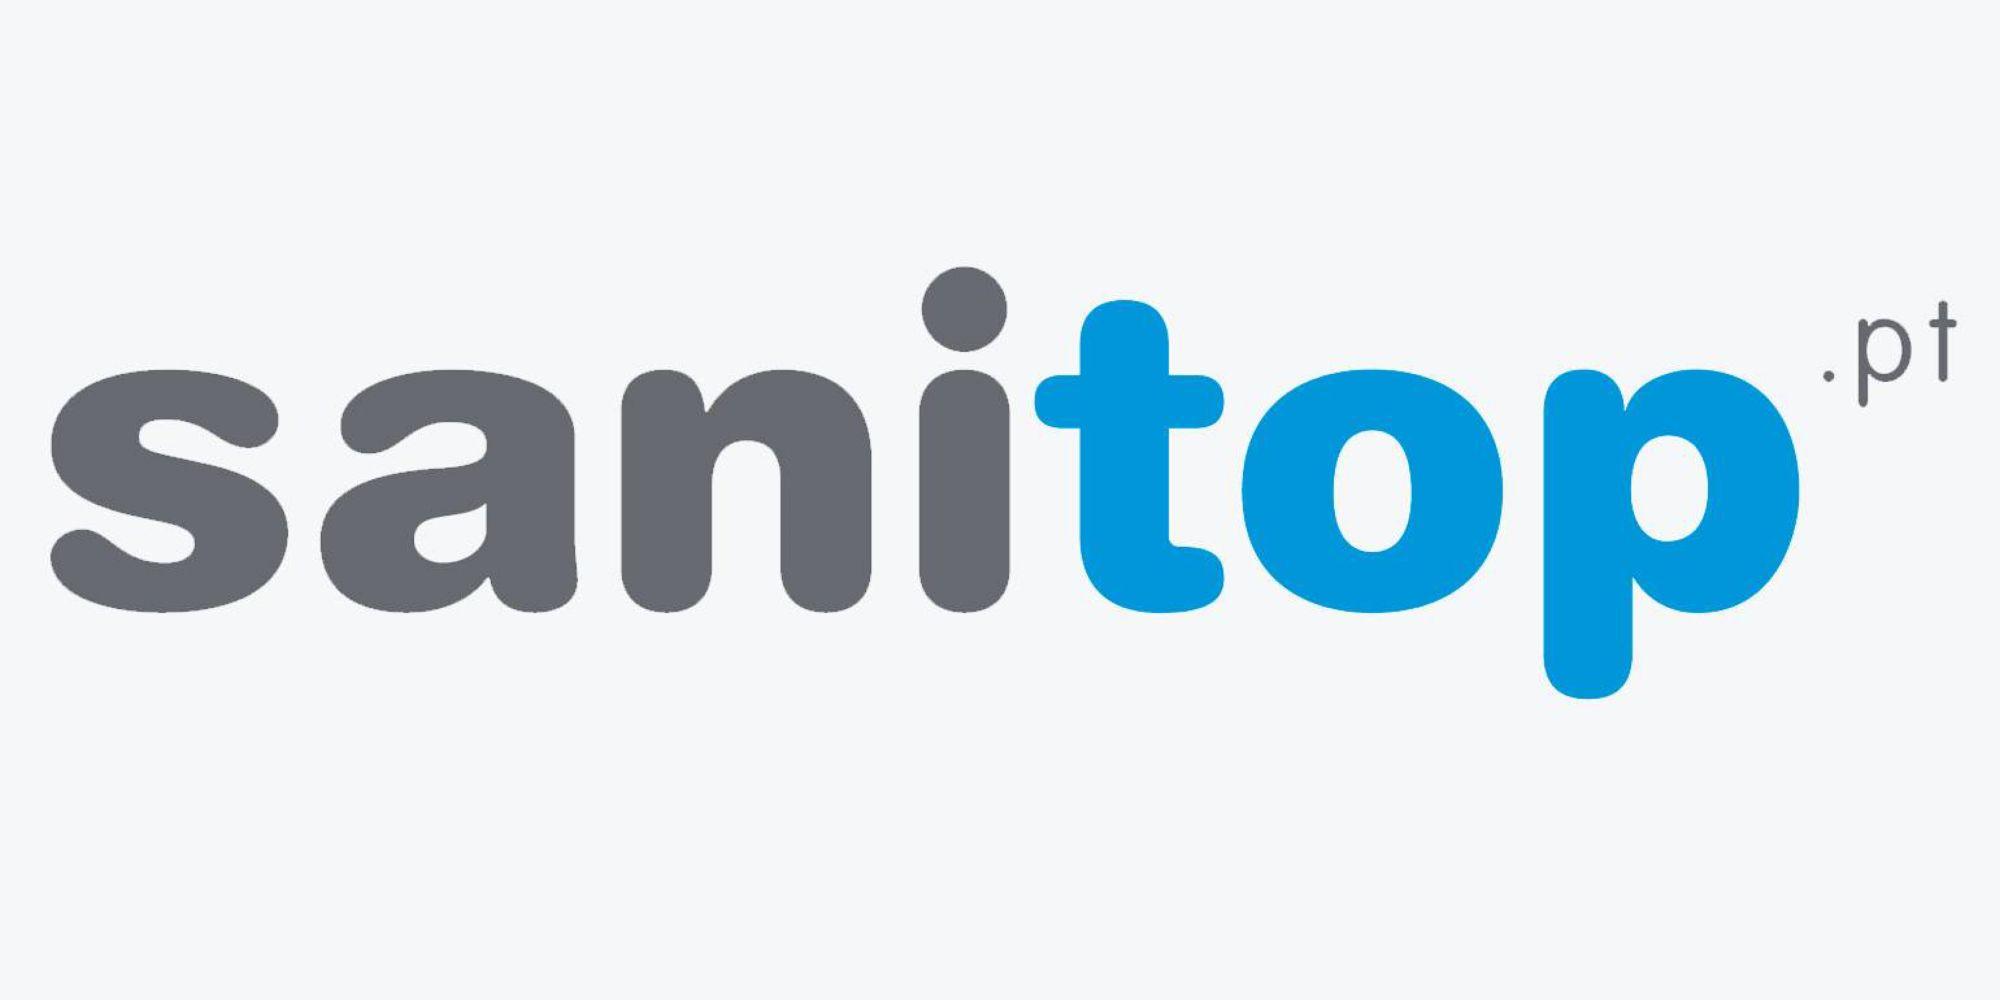 Imag-PT-testo-distri-sanitop-1540x770.jpg